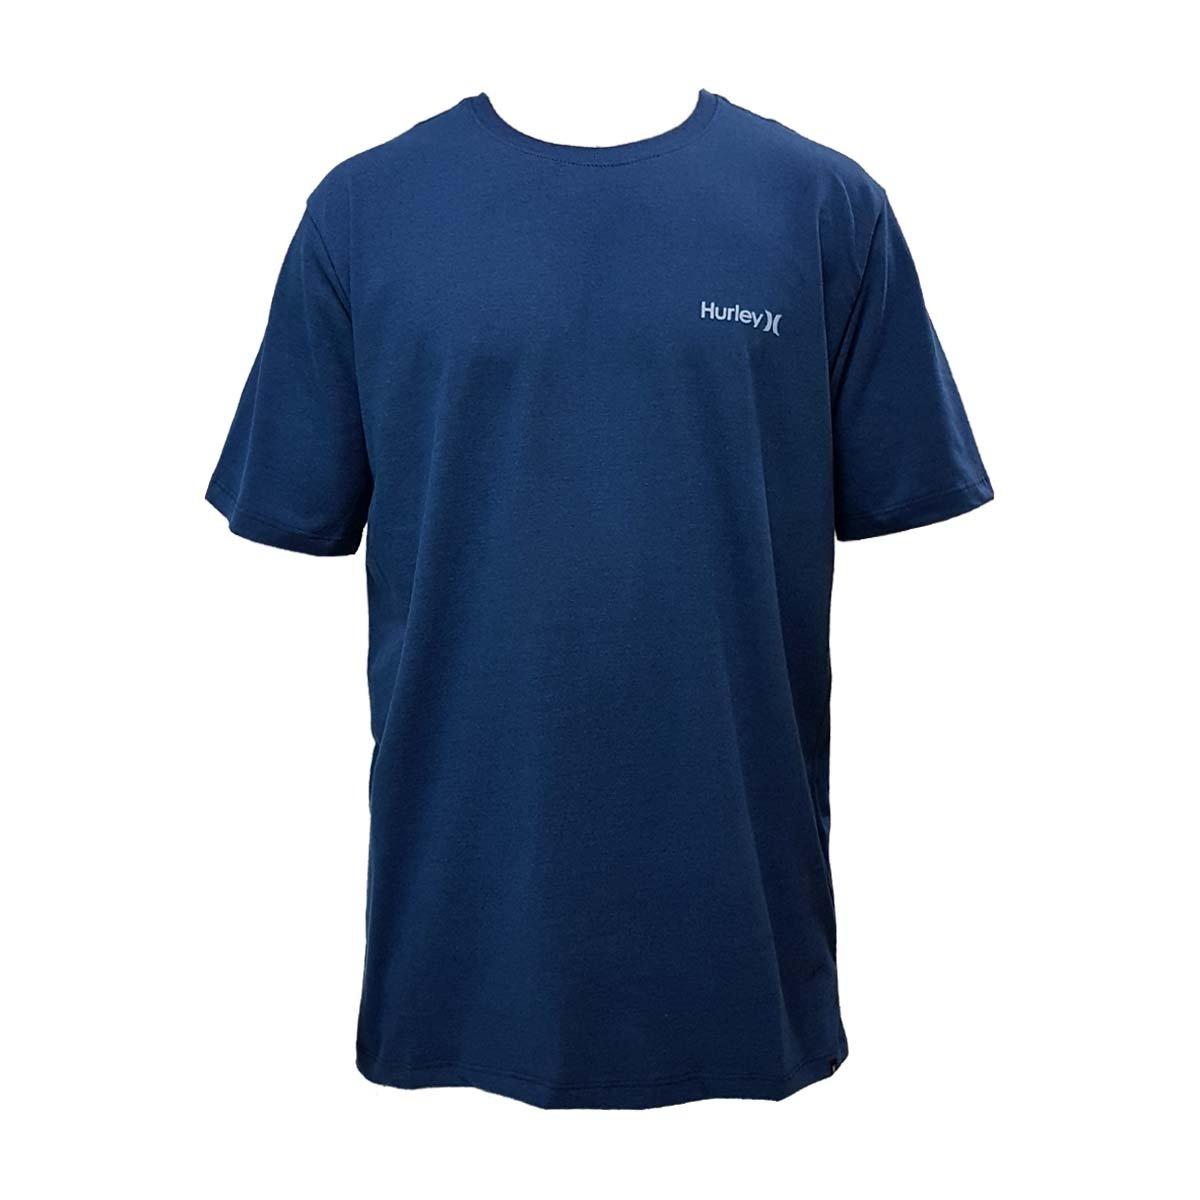 Camiseta Hurley Silk O O Azul - Compre Agora  5667f6704d2